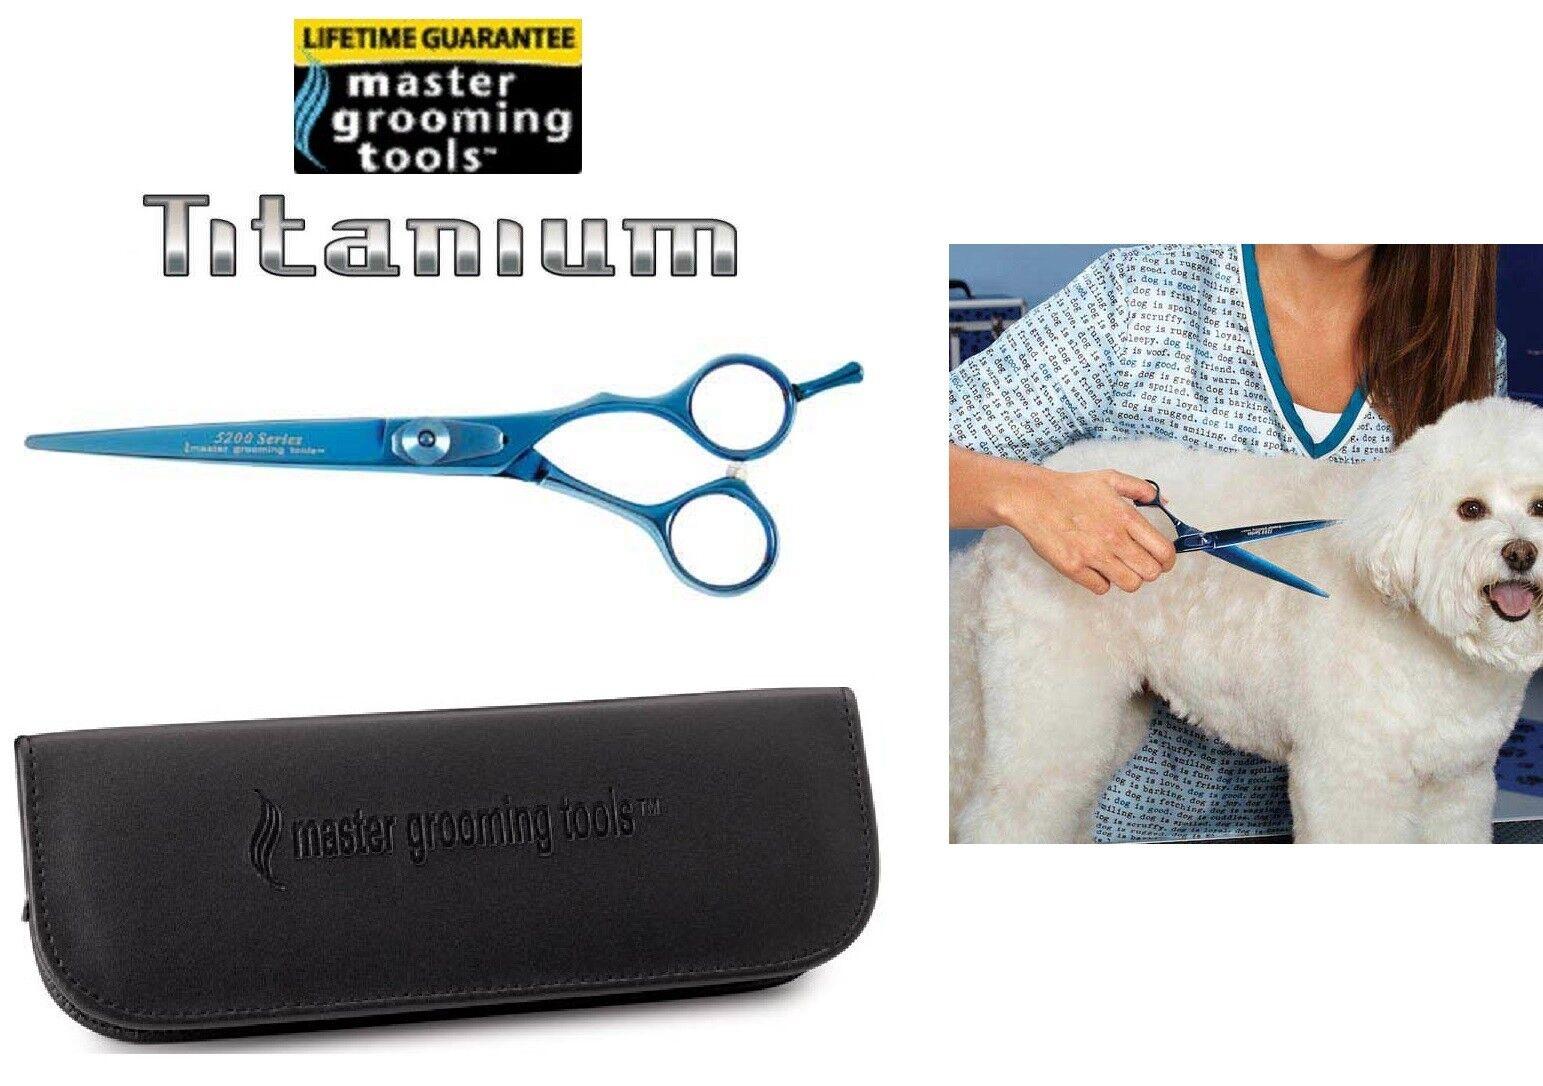 Master Grooming PRO TITANIUM 440C STEEL 6.5  STRAIGHT SHEAR SCISSOR Pet GROOMING